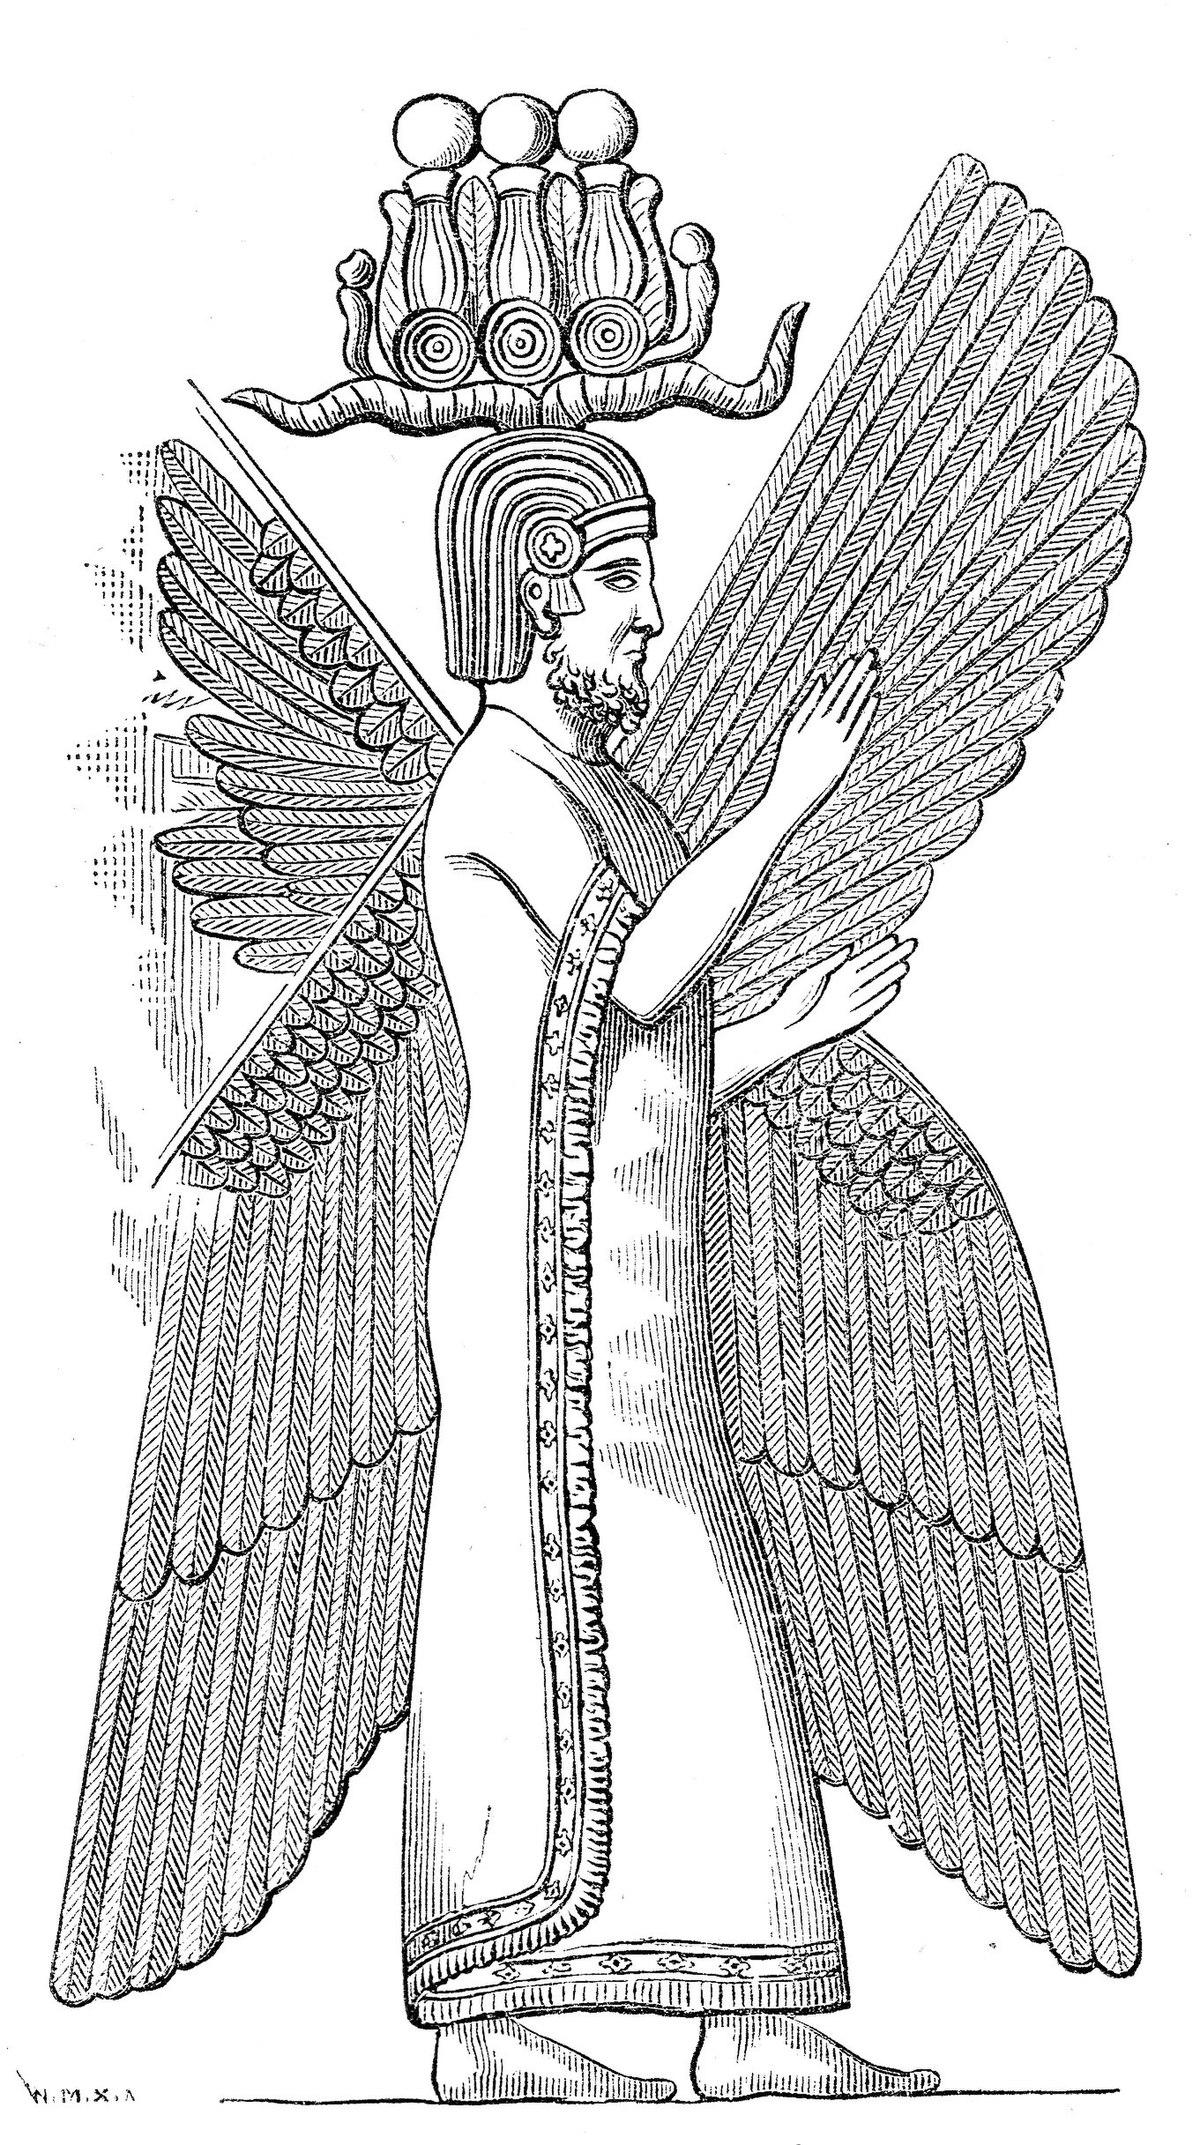 Cyrus the Great - Wikipedia